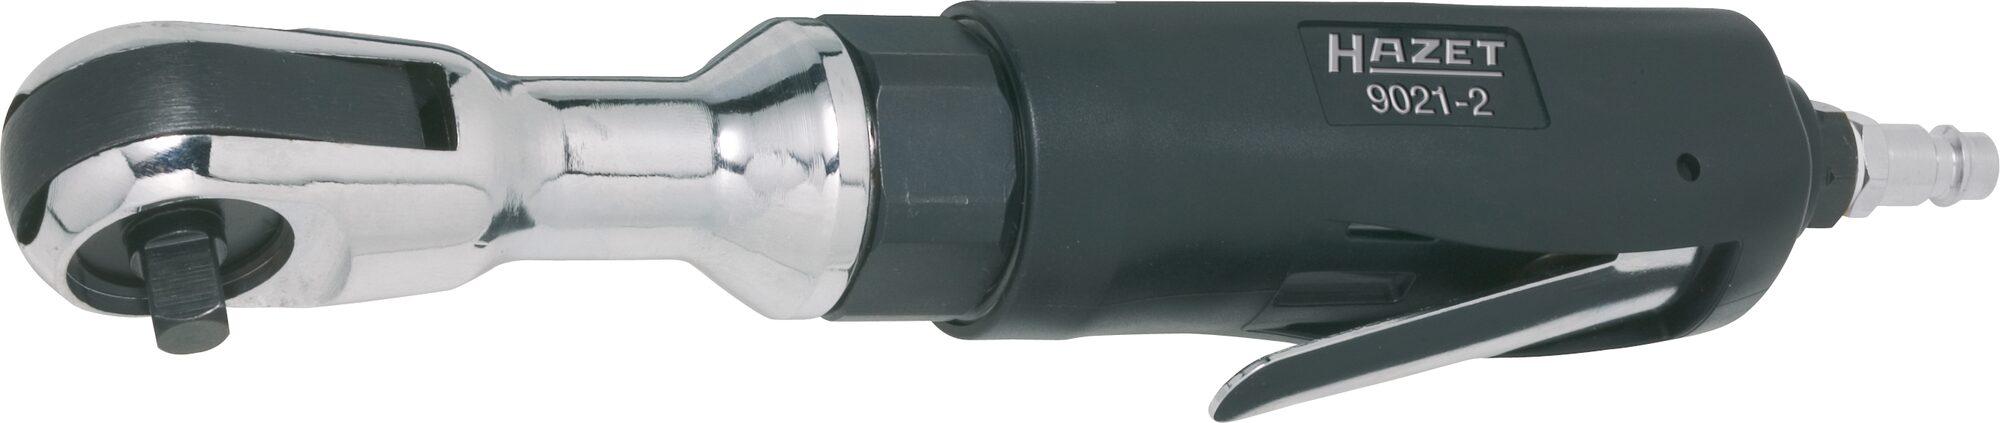 HAZET Ratschenschrauber 9022-2 ∙ Vierkant massiv 12,5 mm (1/2 Zoll)